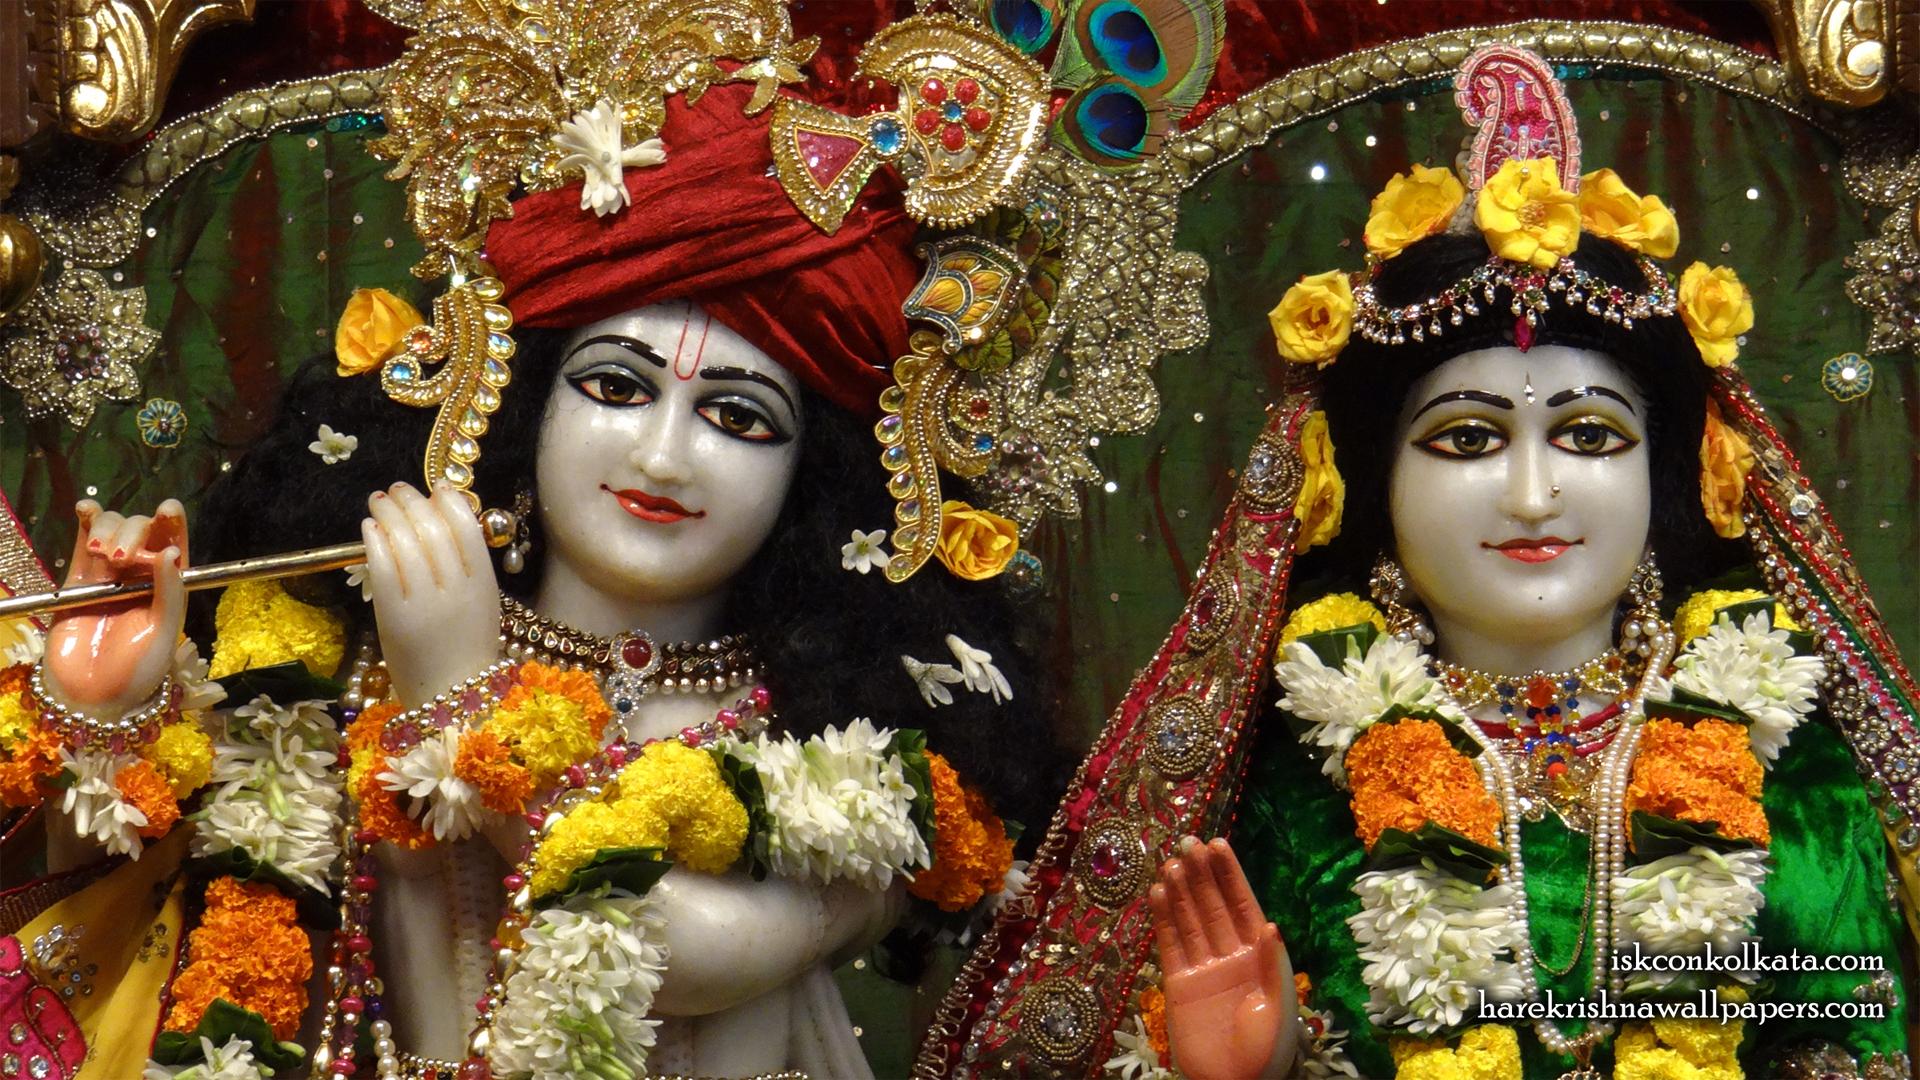 Sri Sri Radha Govinda Close up Wallpaper (006) Size 1920x1080 Download